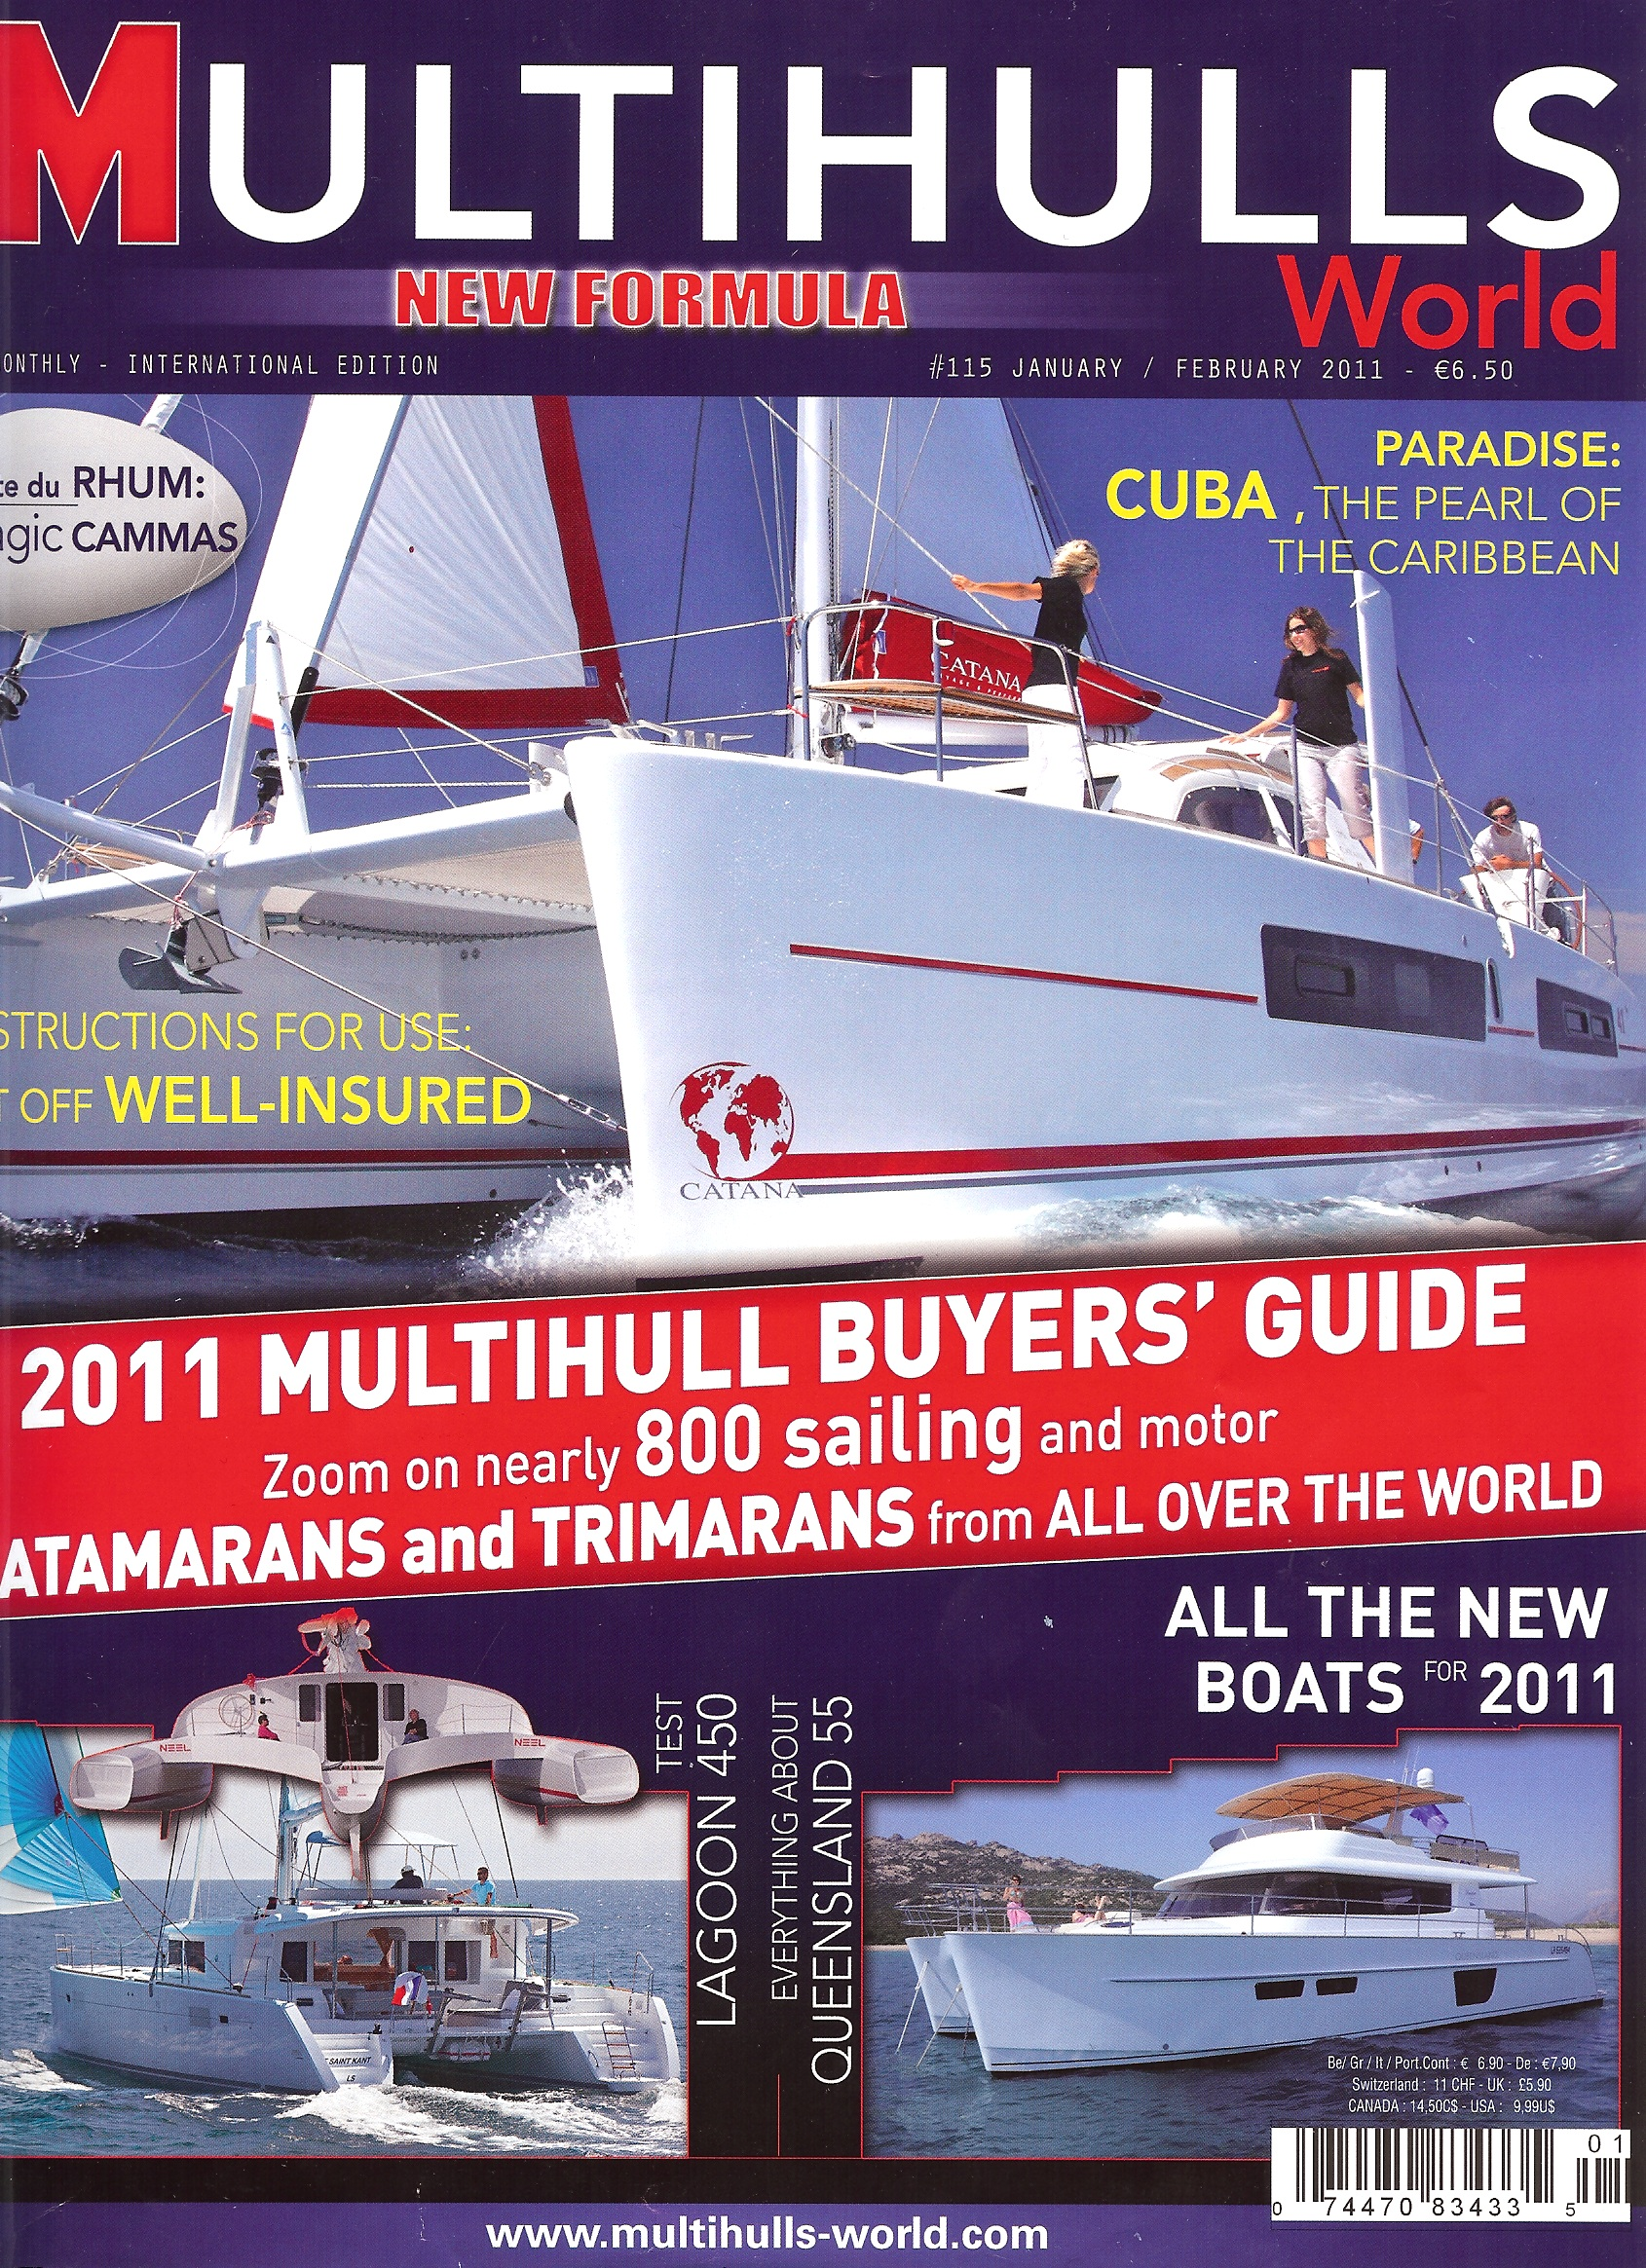 NFN_Multihulls_Cover.jpg